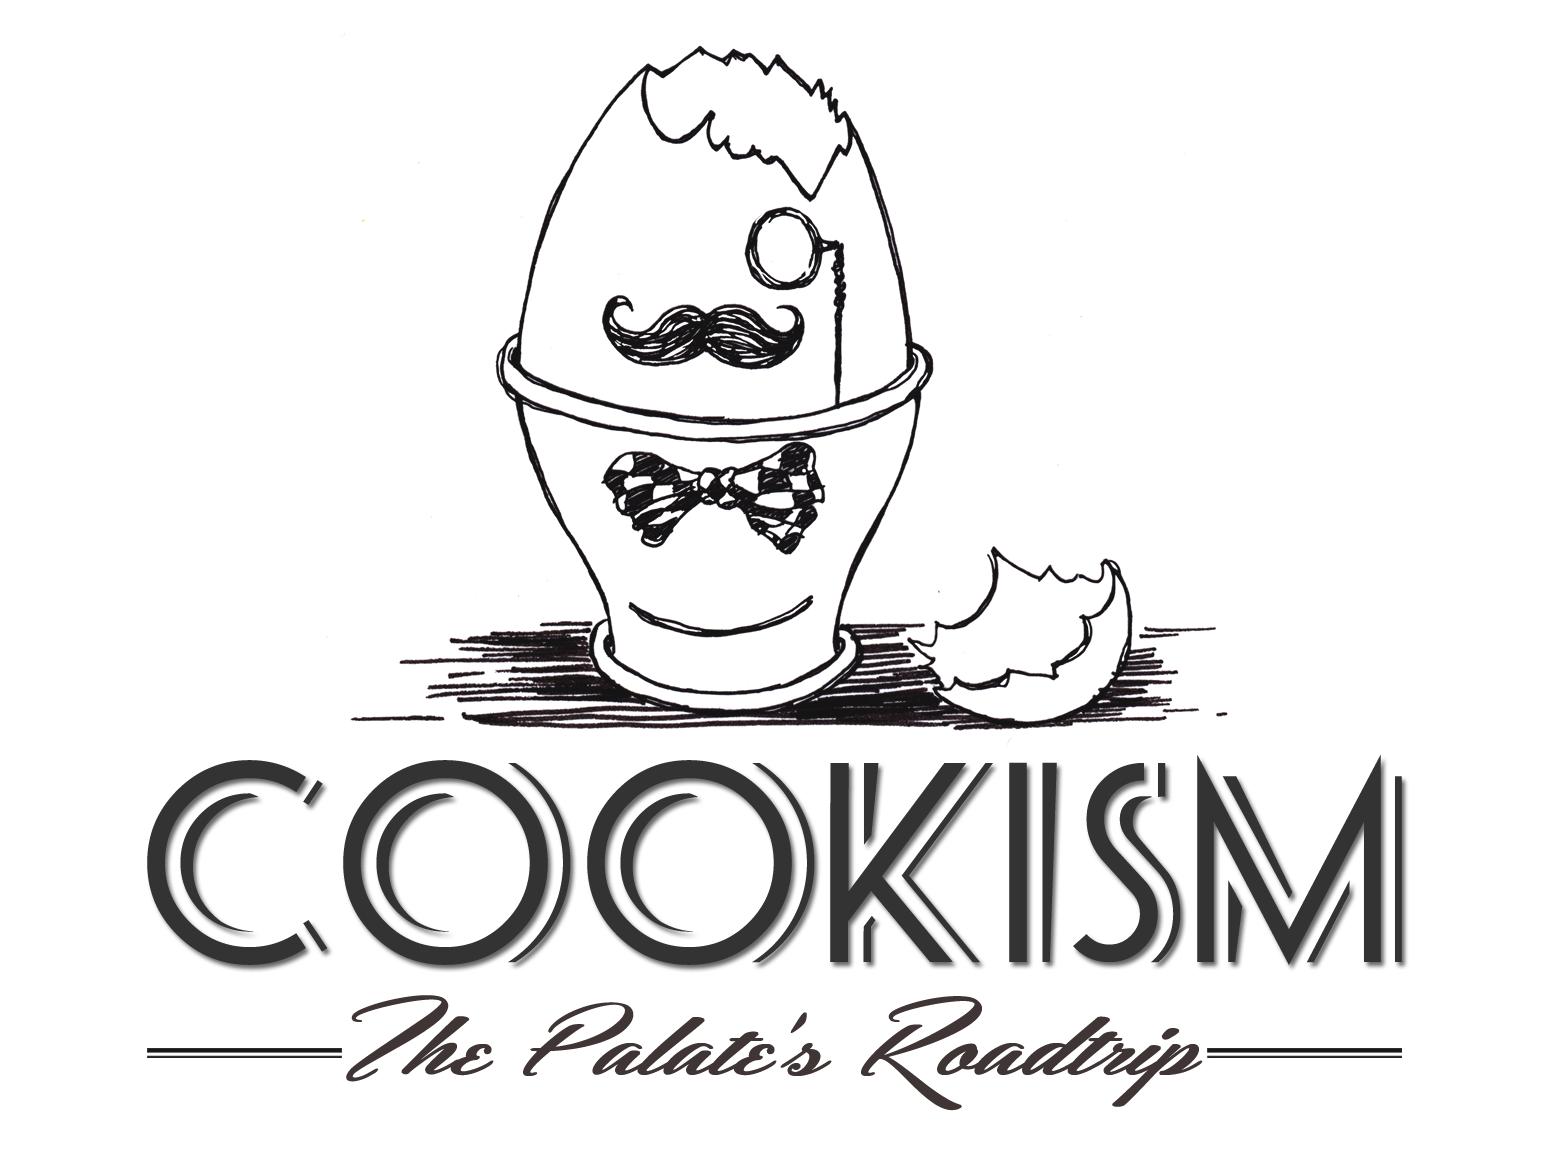 Cookism